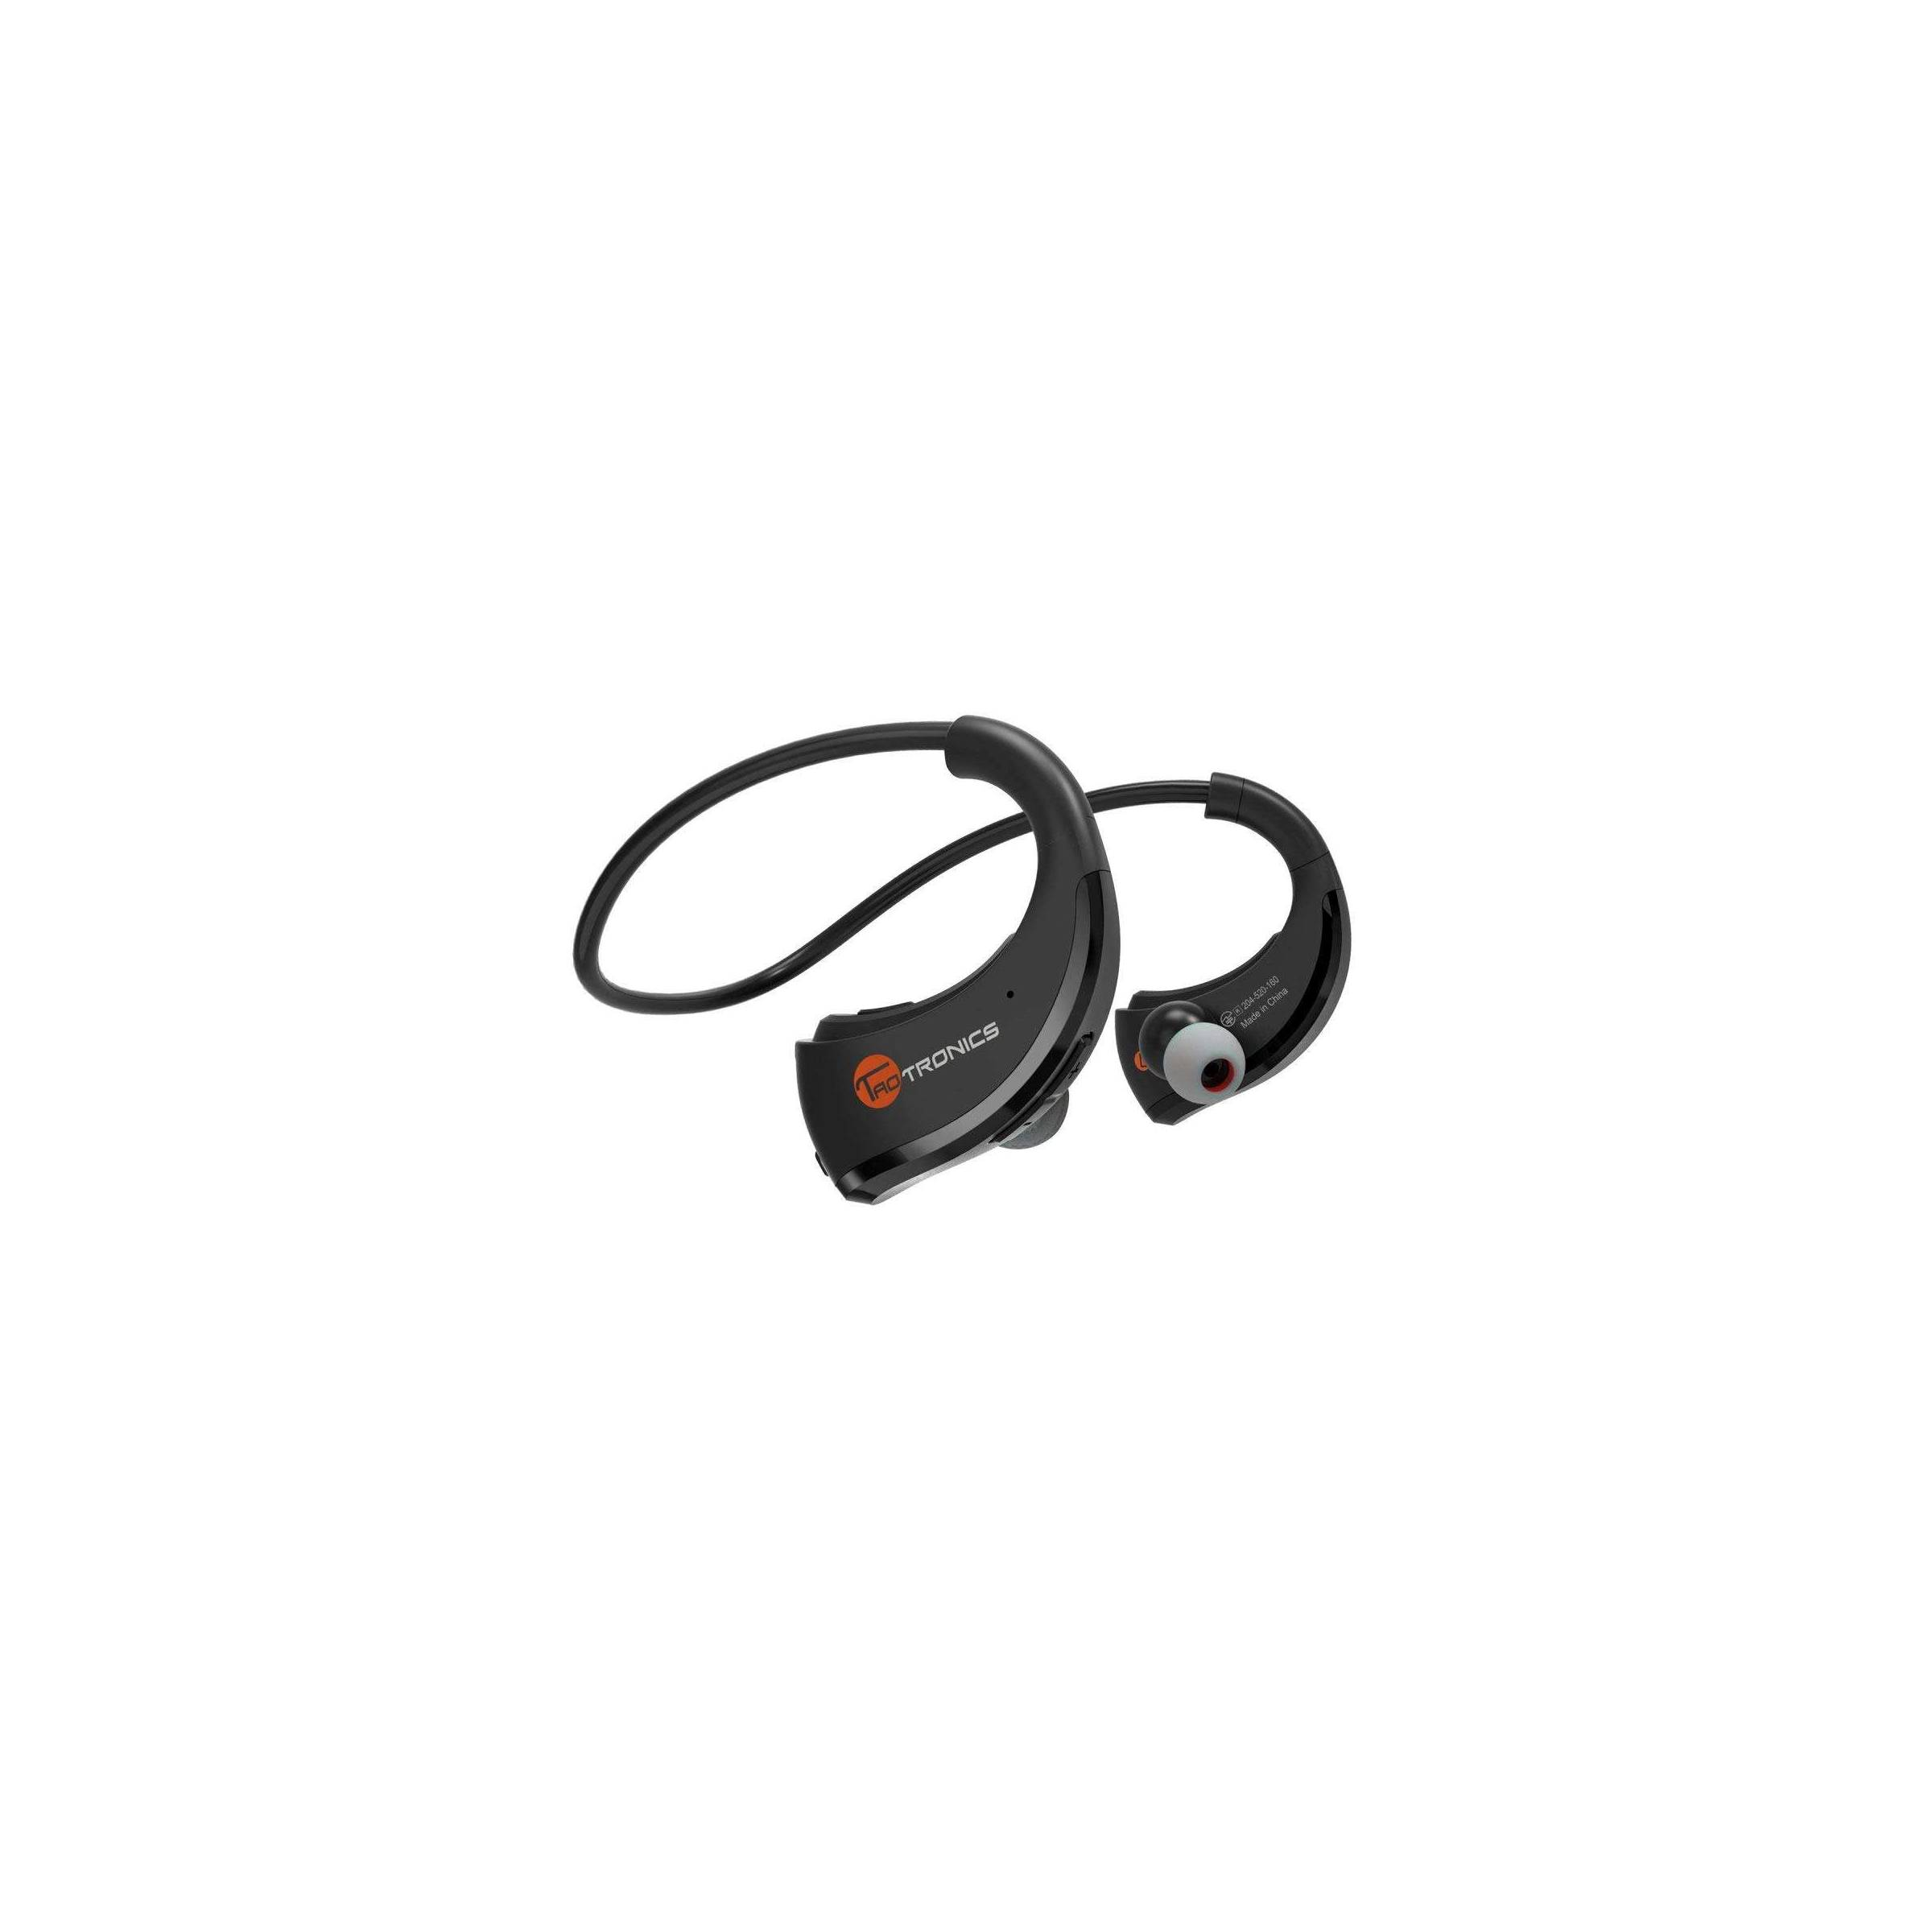 taotronics – Taotronics bluetooth headphones wireless in-ear earbuds fra mackabler.dk